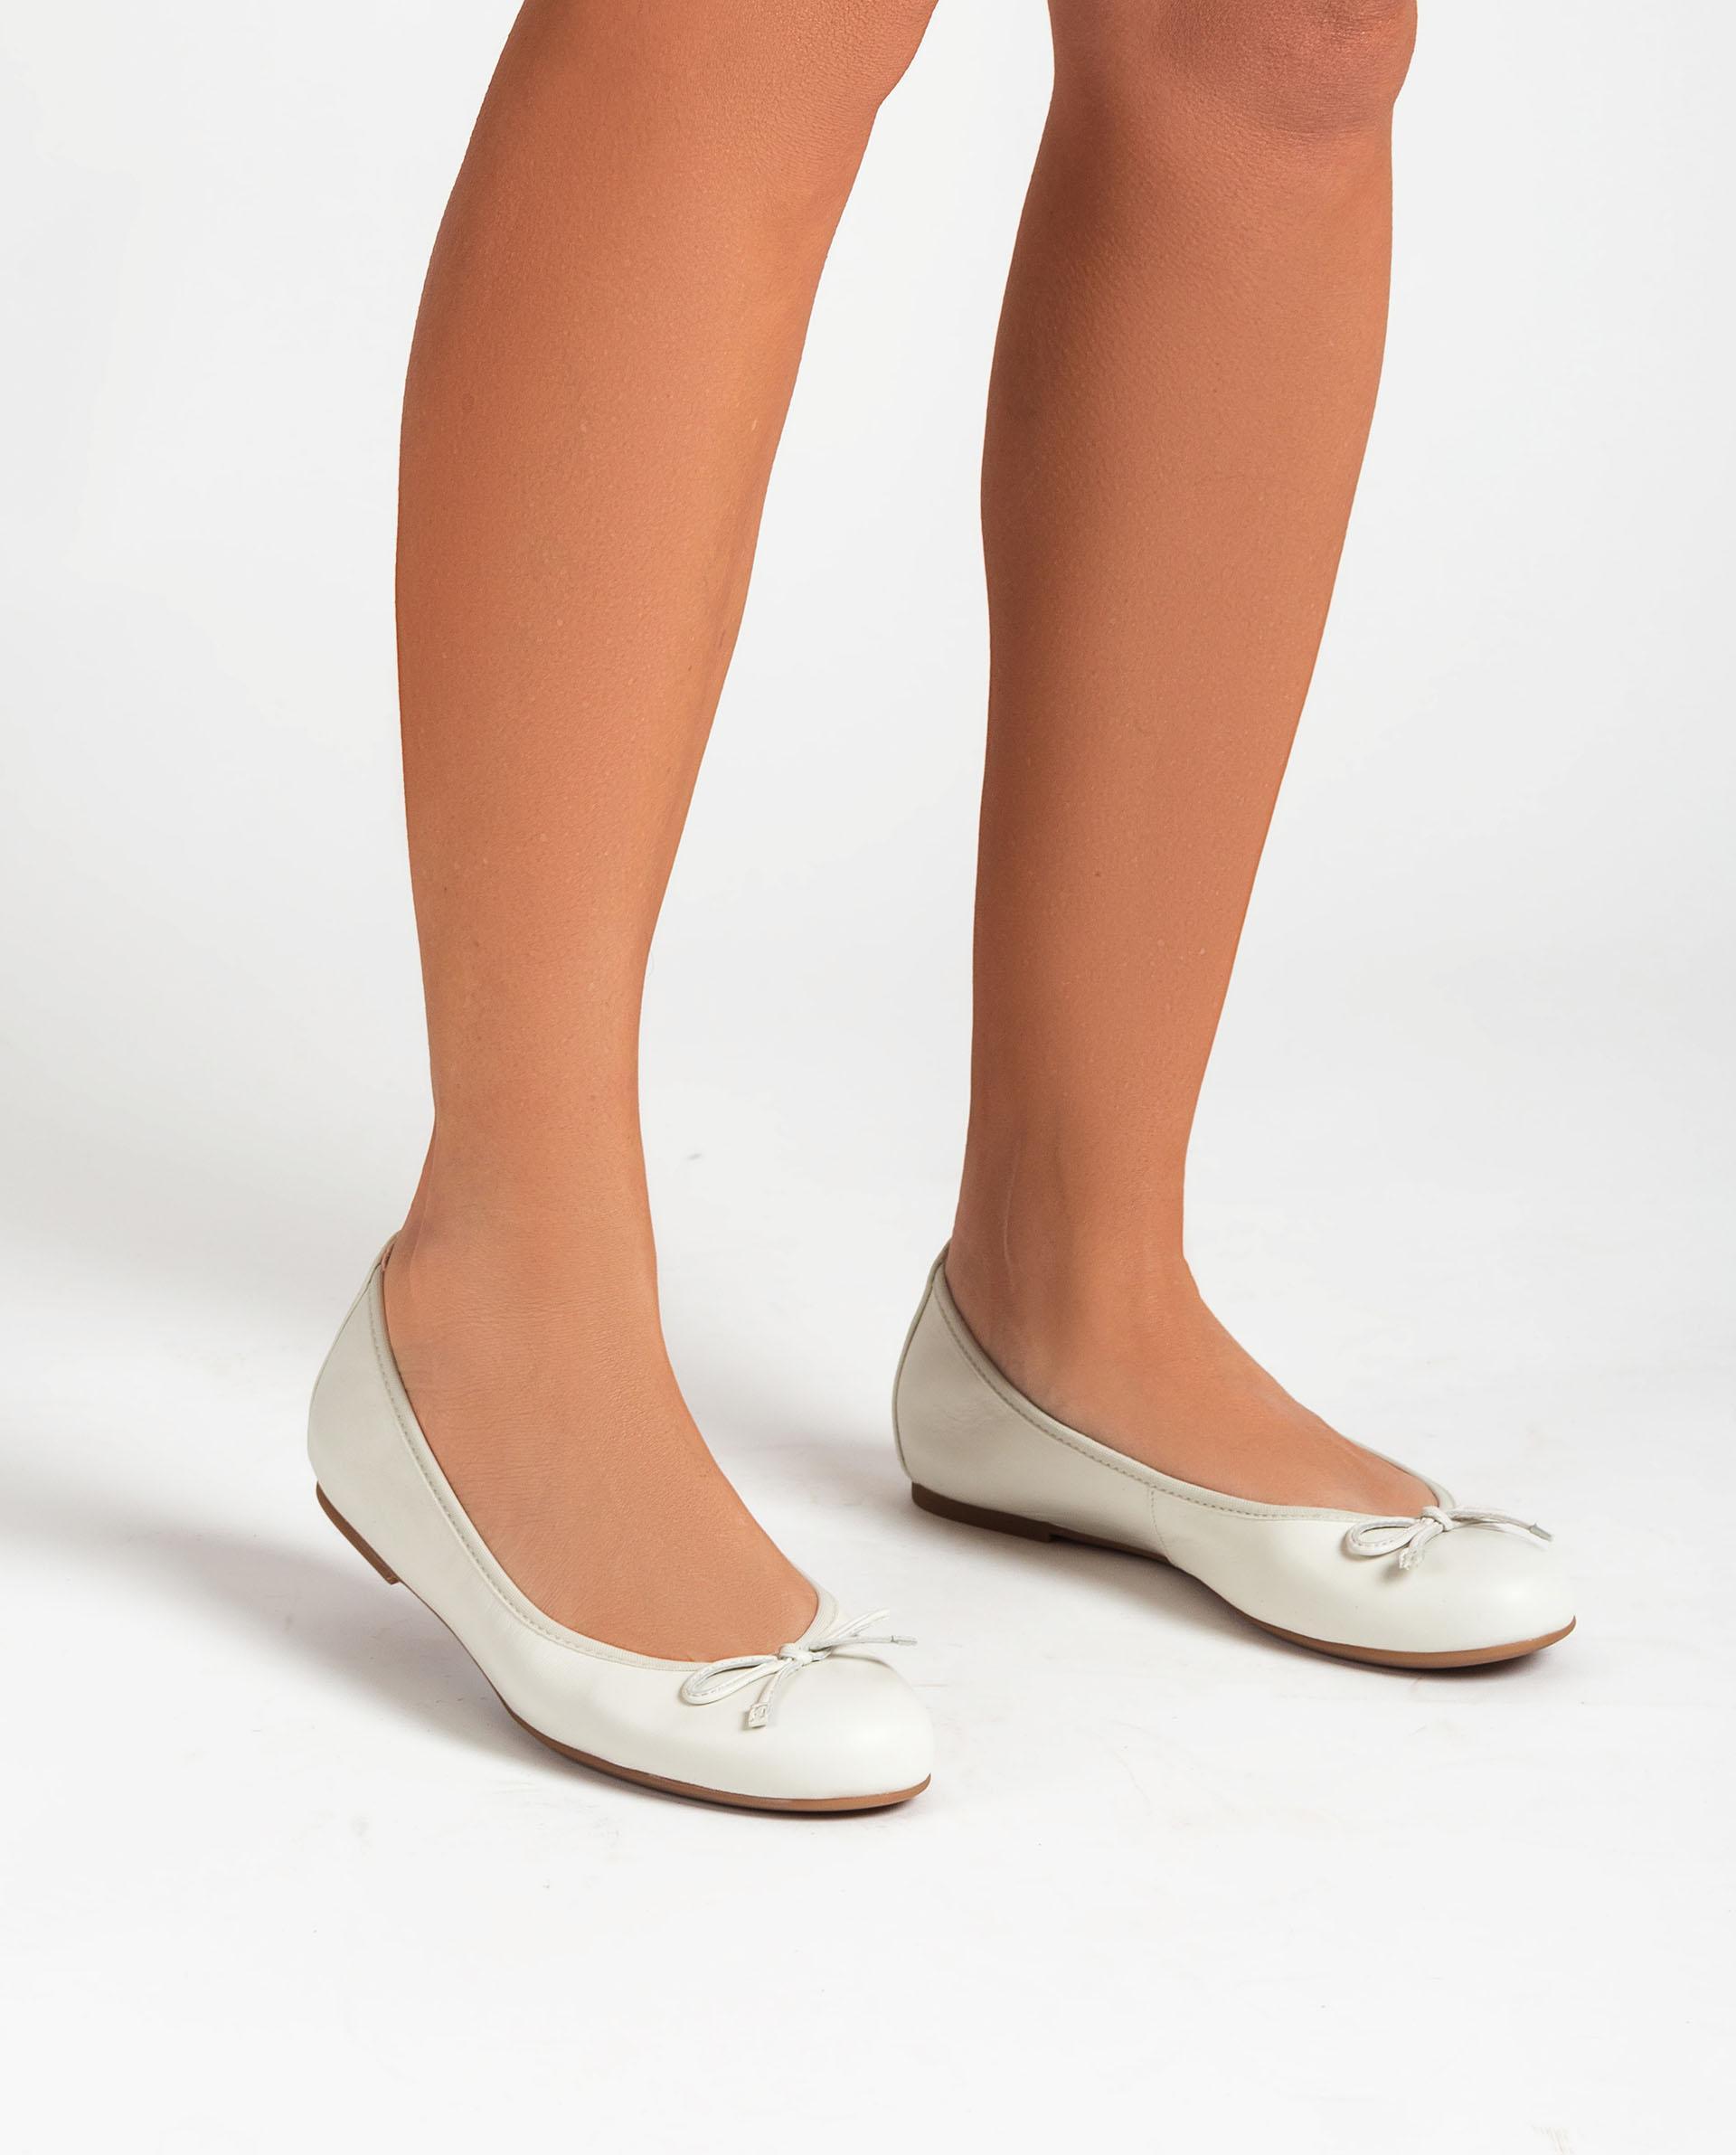 UNISA Leather ballerinas embellished with bow ACOR_21_NS 2